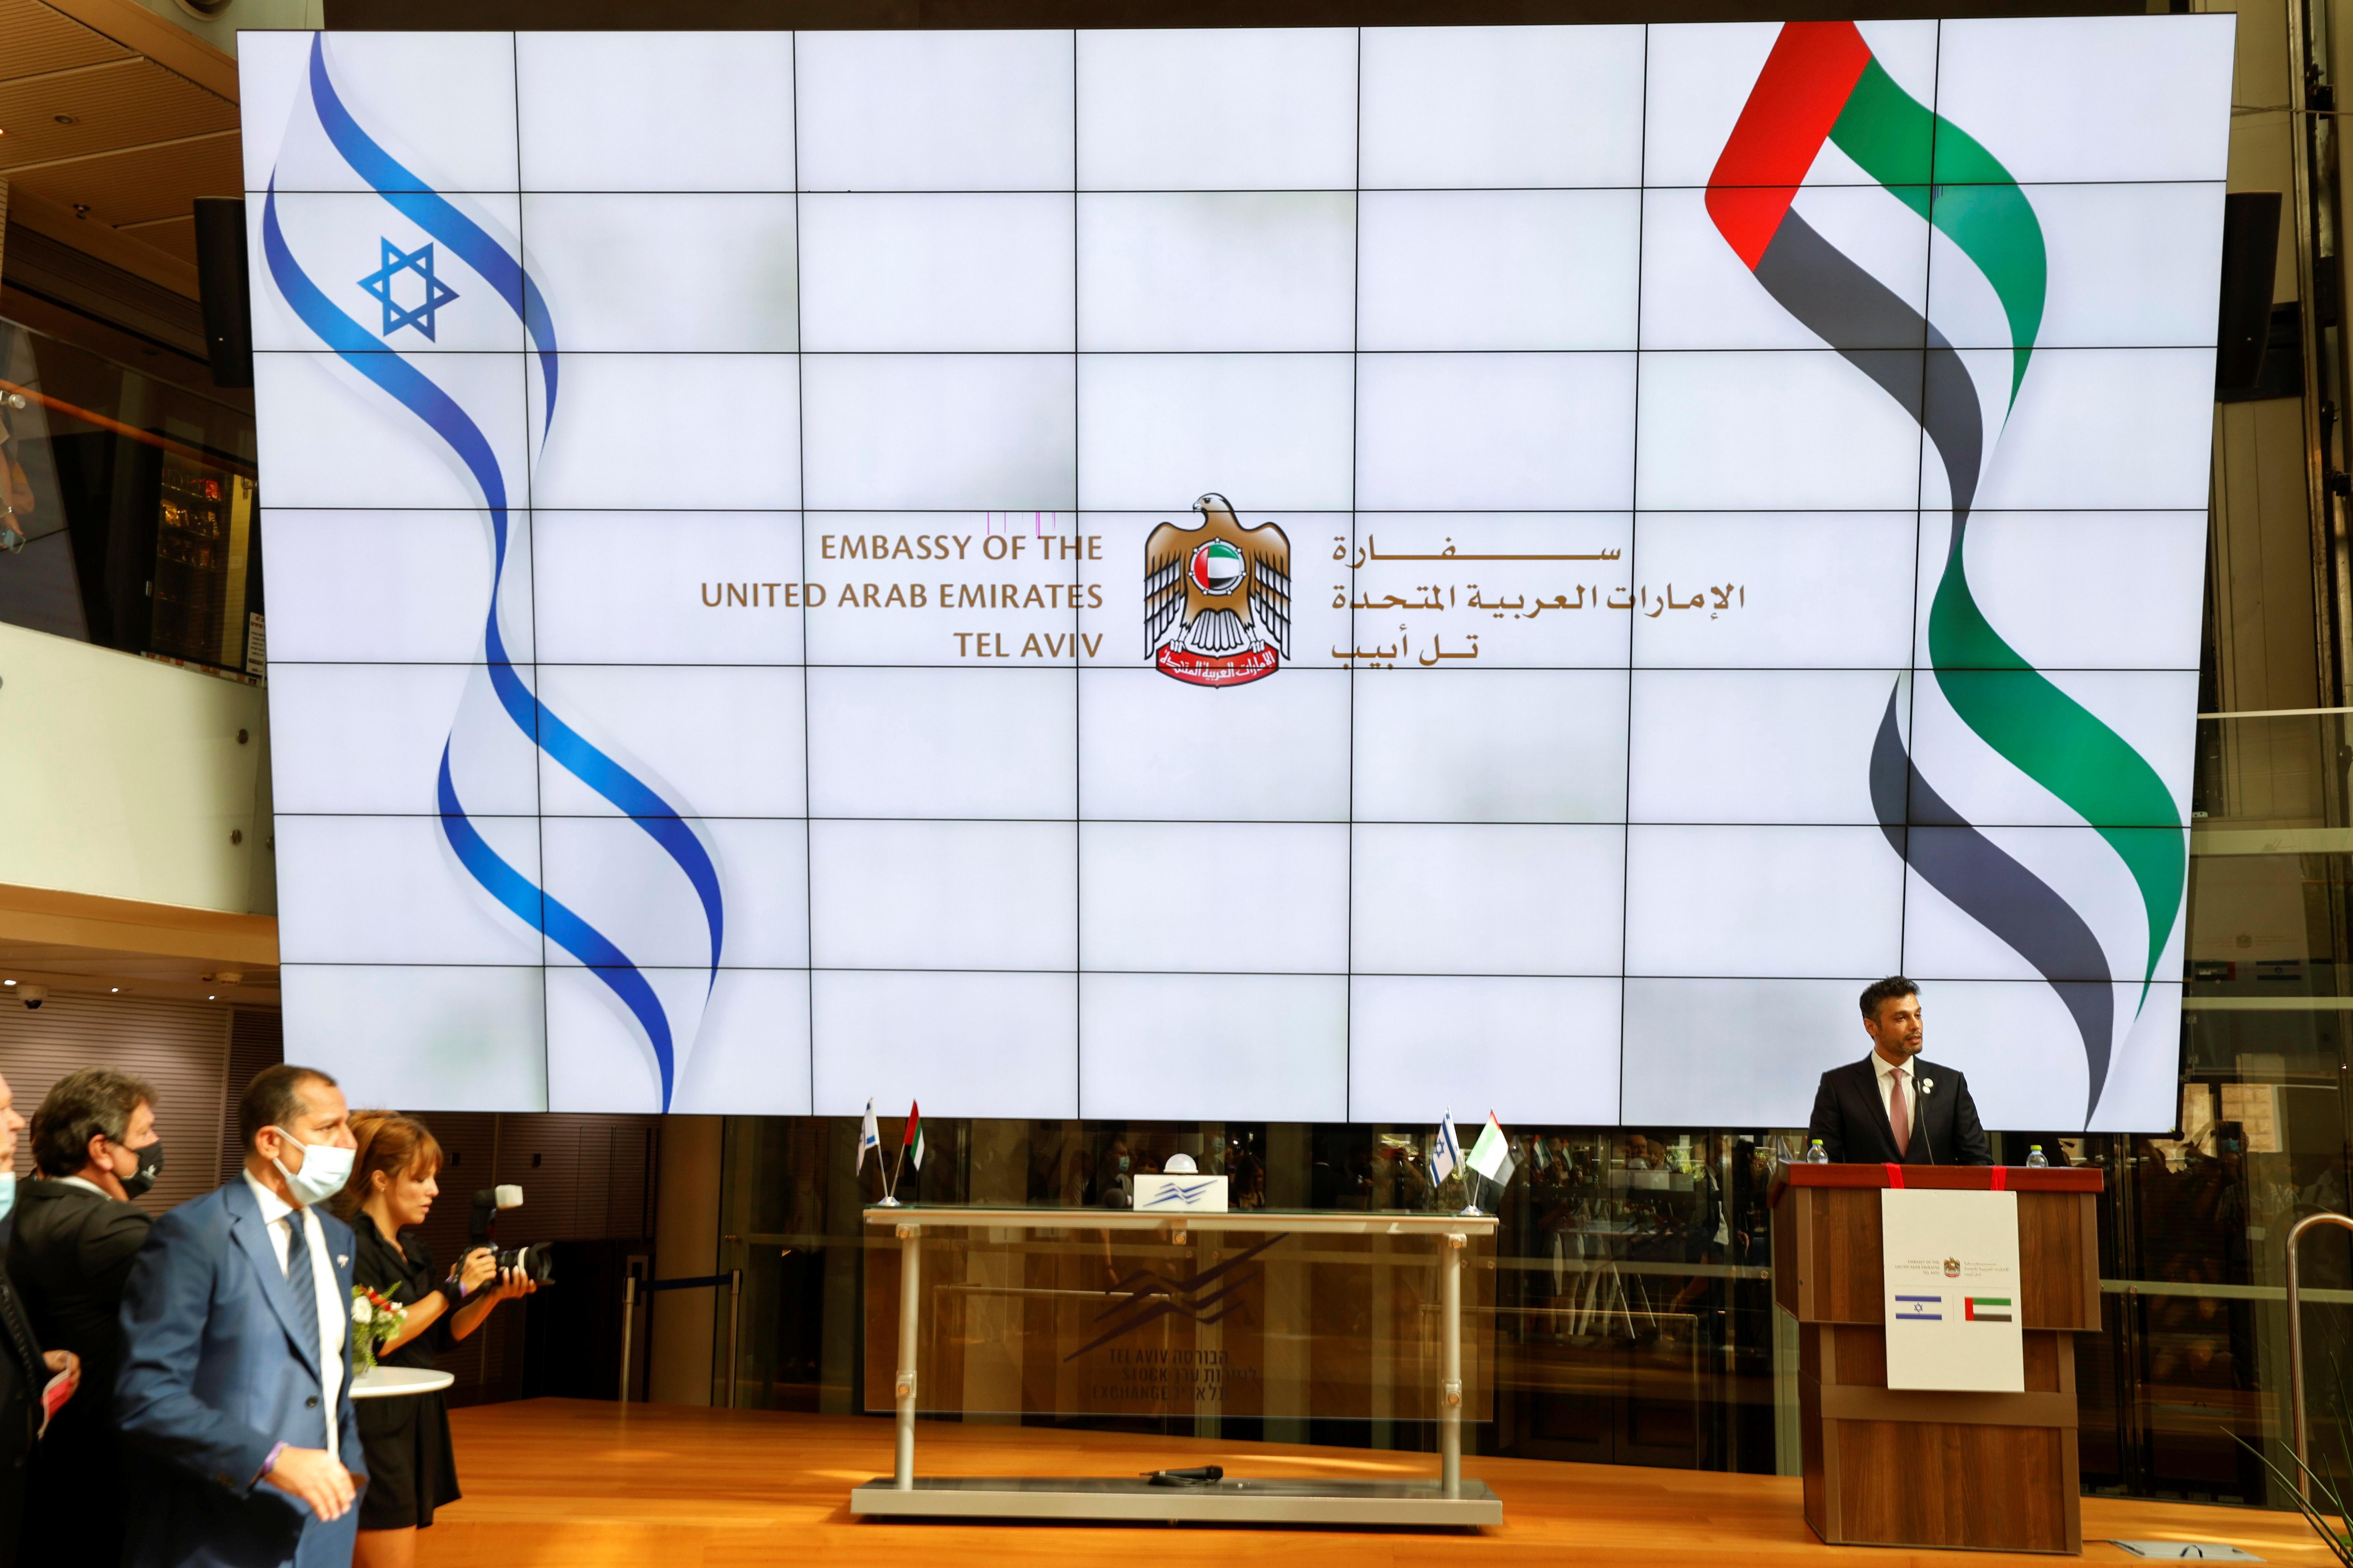 UAE Ambassador to Israel, Mohamed Al Khaja, speaks during the opening ceremony of the Emirati embassy in Tel Aviv, Israel July 14, 2021. REUTERS/Amir Cohen